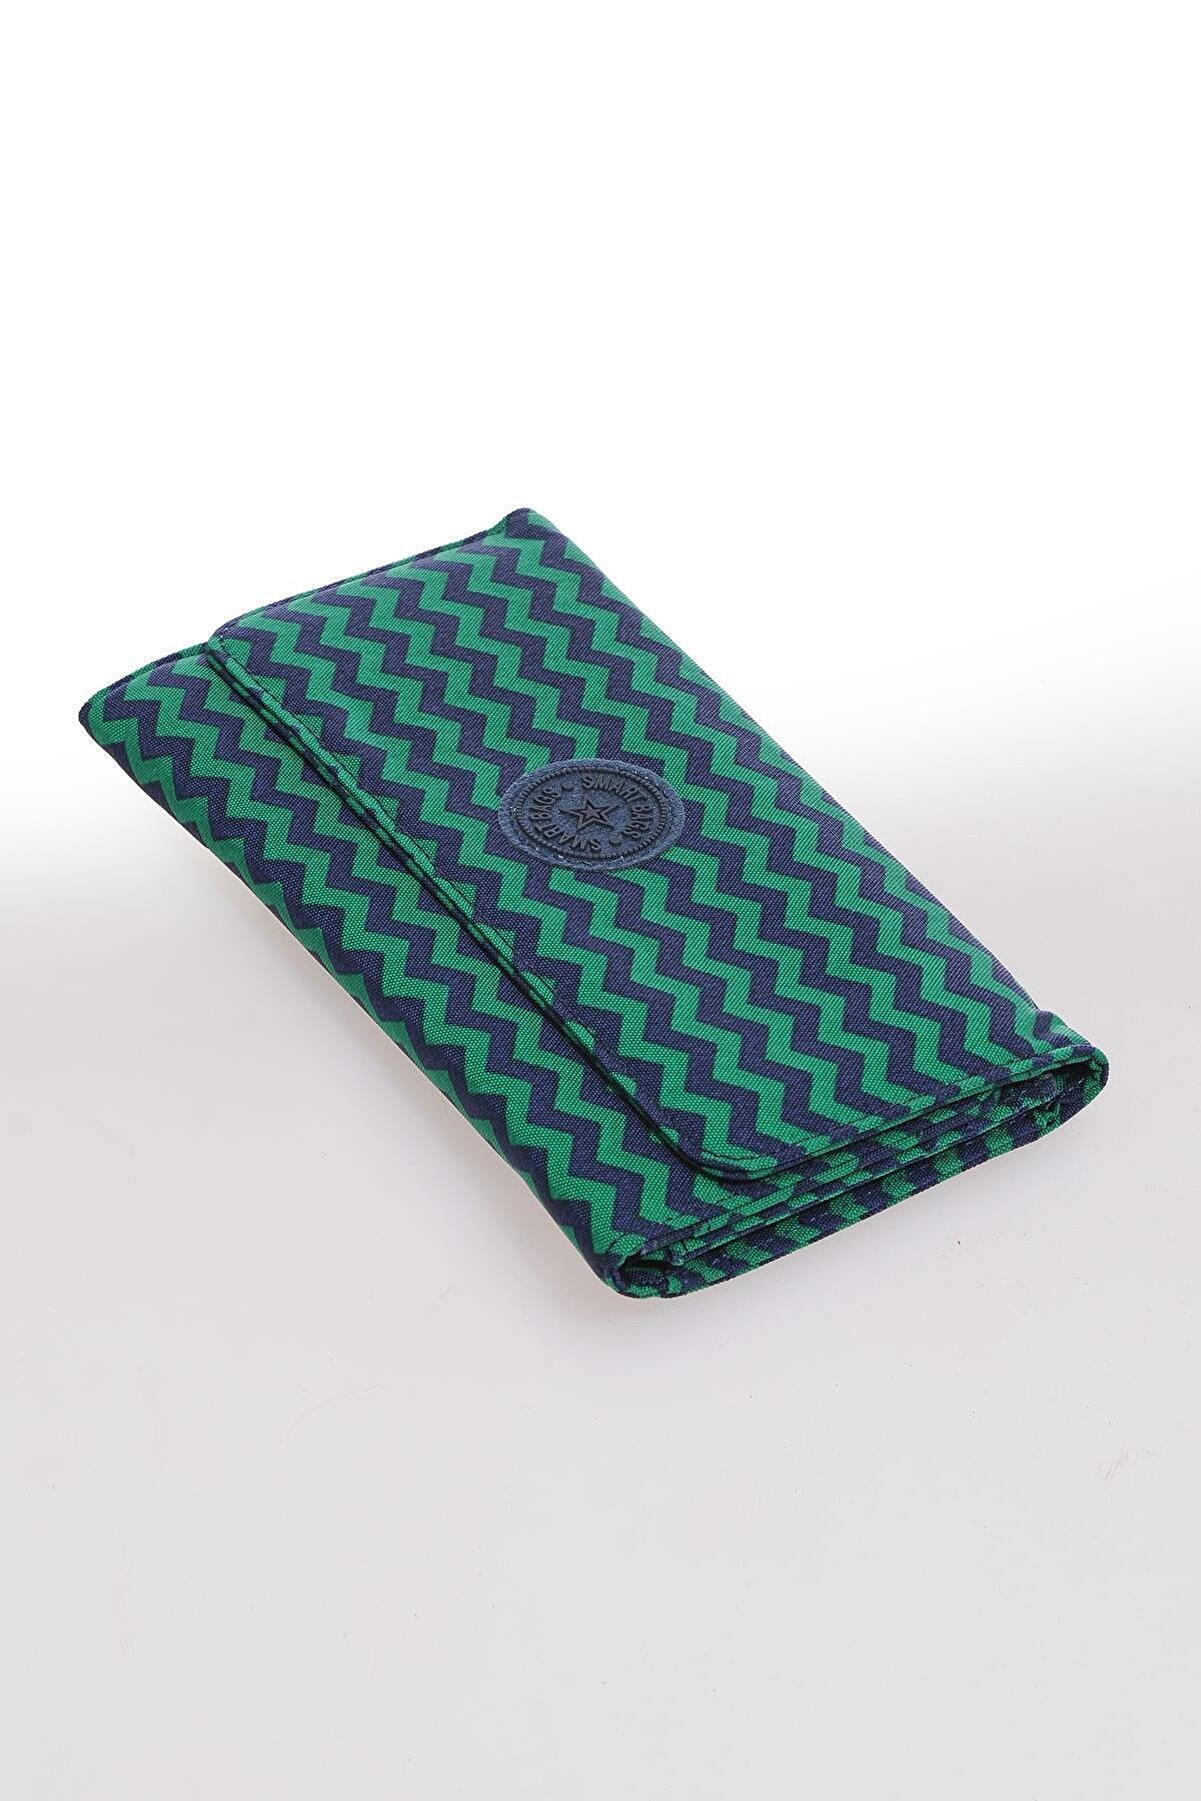 Smart Bags Smb1225-0066 Lacivert/yeşil Kadın Cüzdan